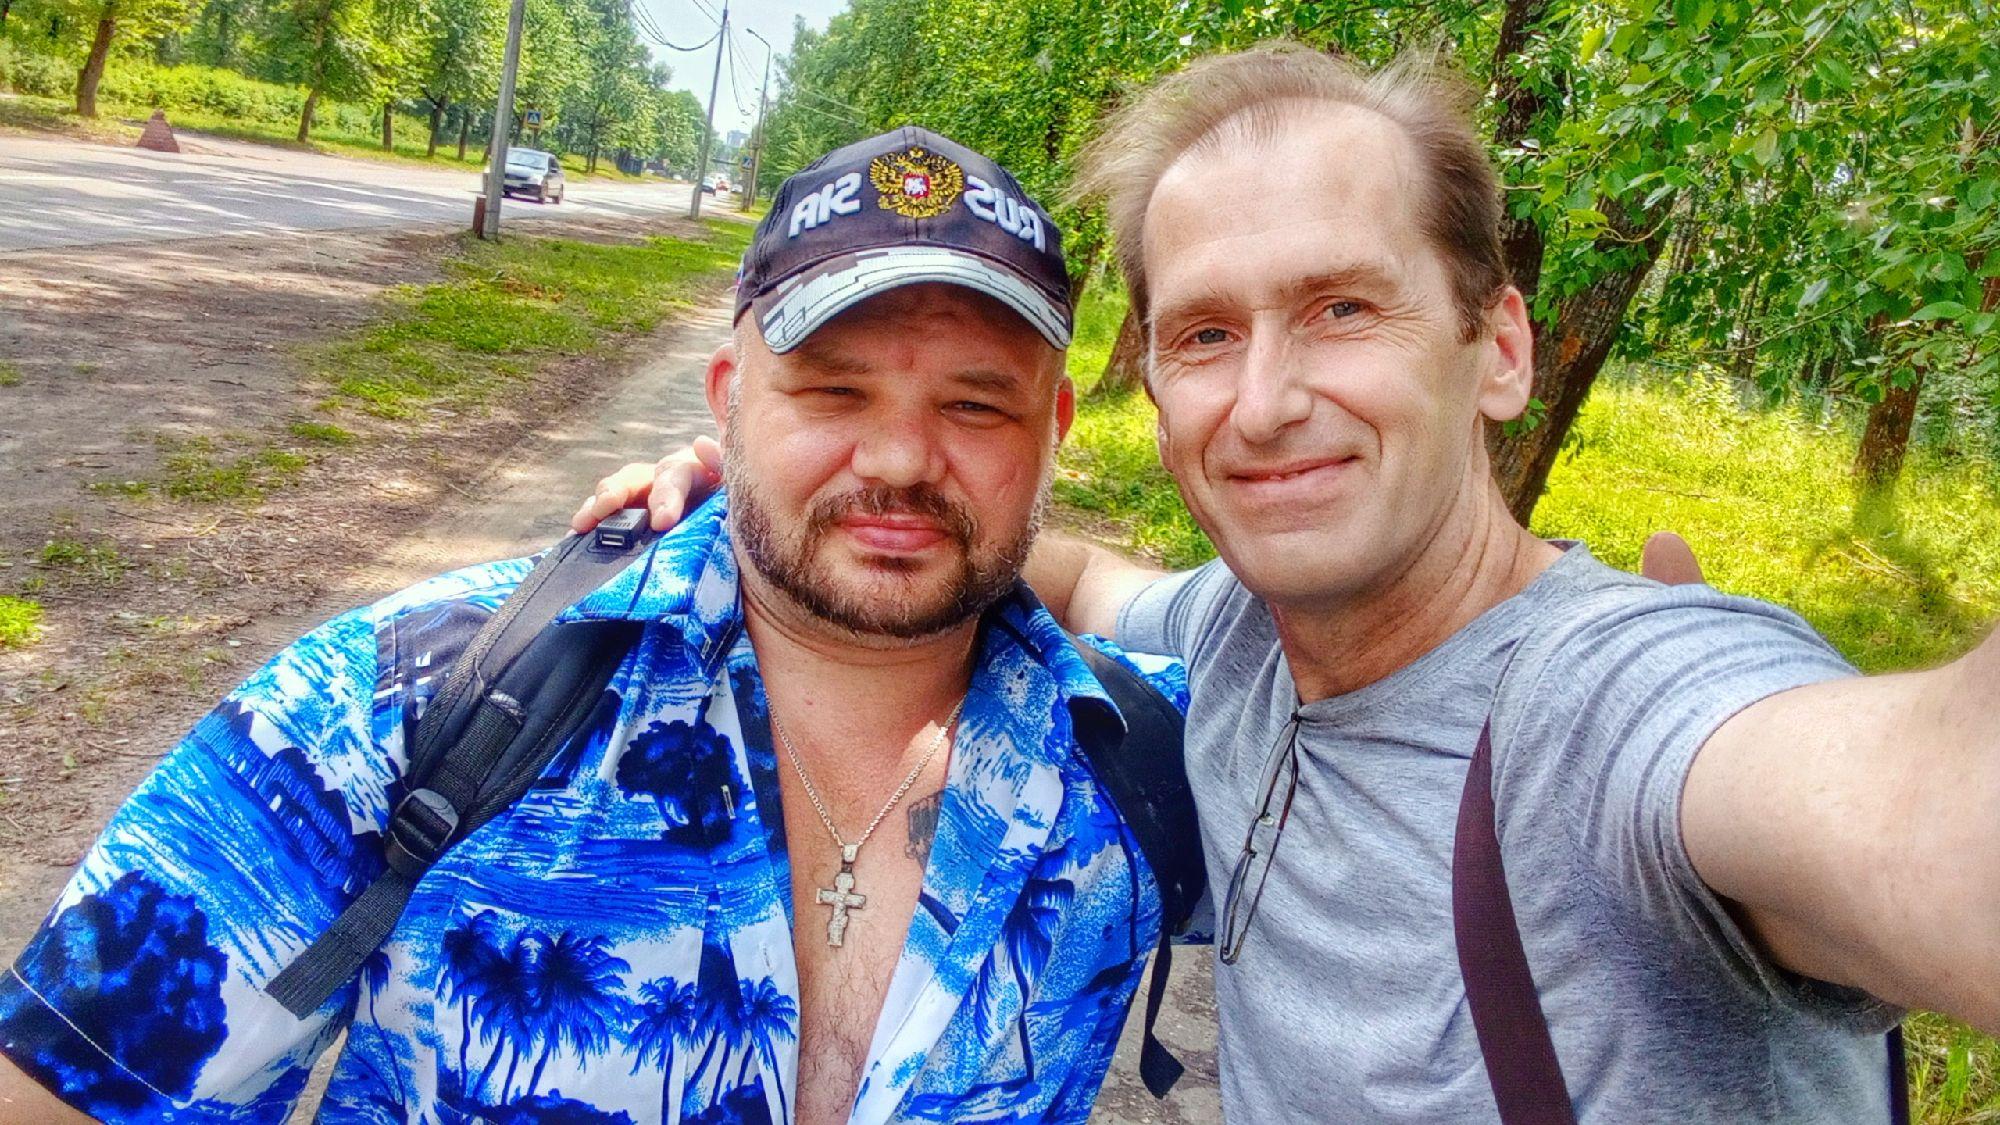 Я и Александр Самойлов. Себяшка вам в ленту.